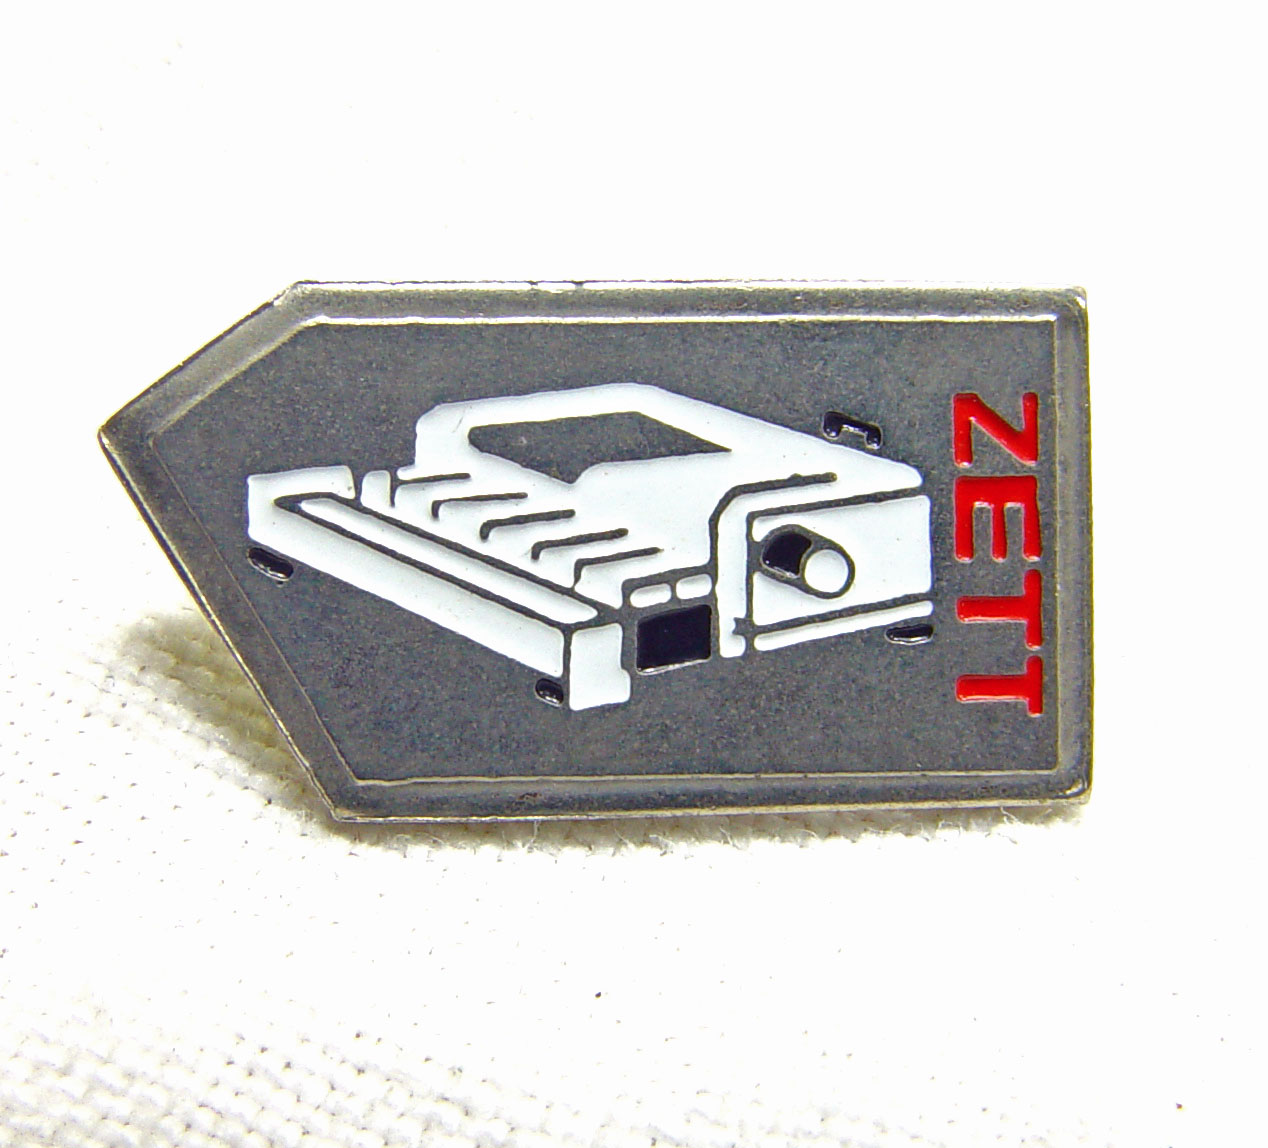 Wallpaper Appareils photos 2497-2  ZETT  Pins  Projecteur diapos, collection AMI